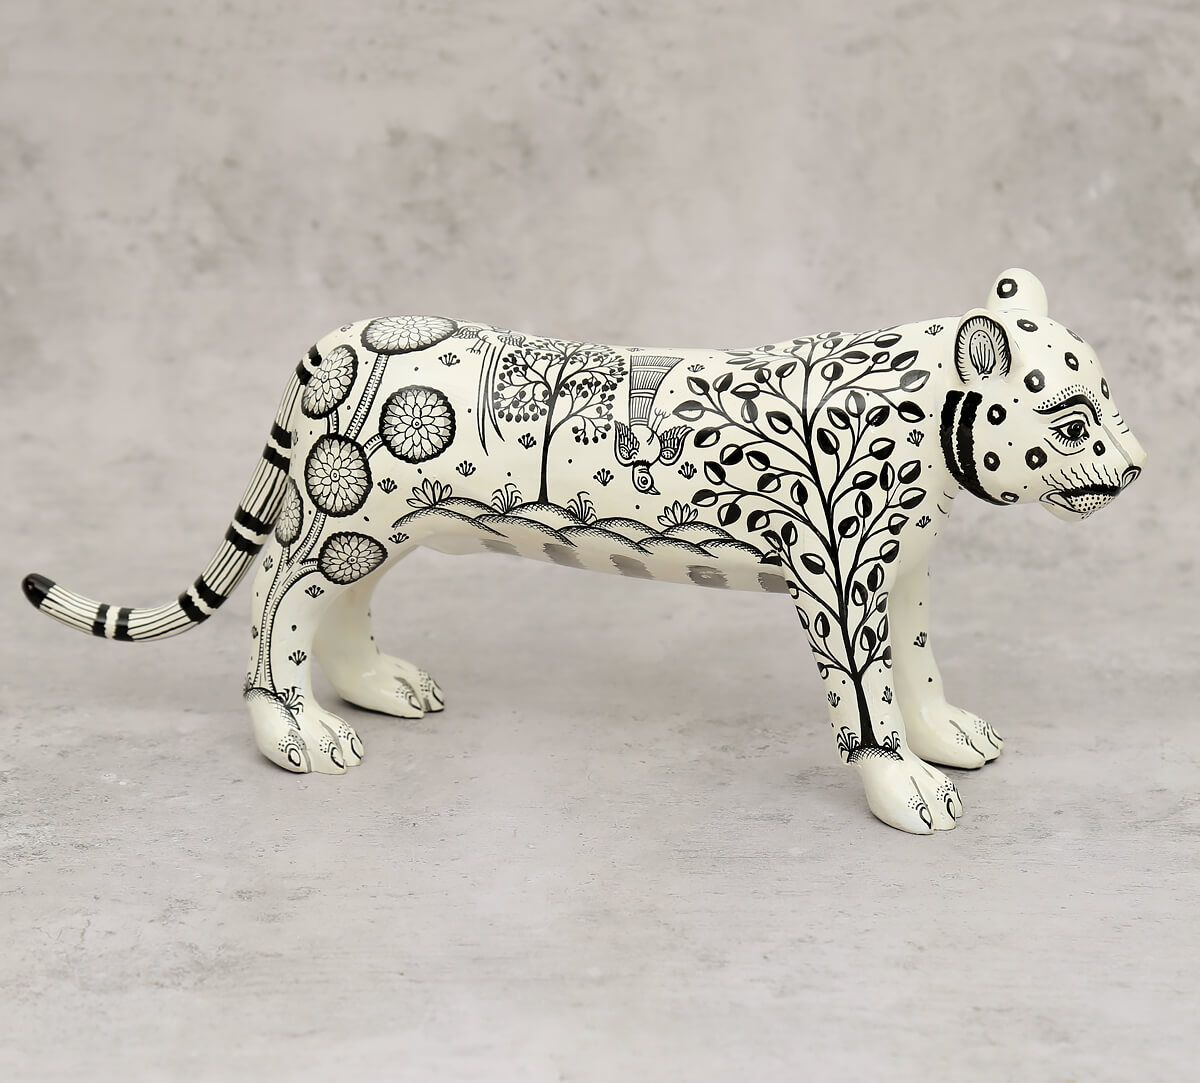 India Circus Pattachitra Art White Tiger